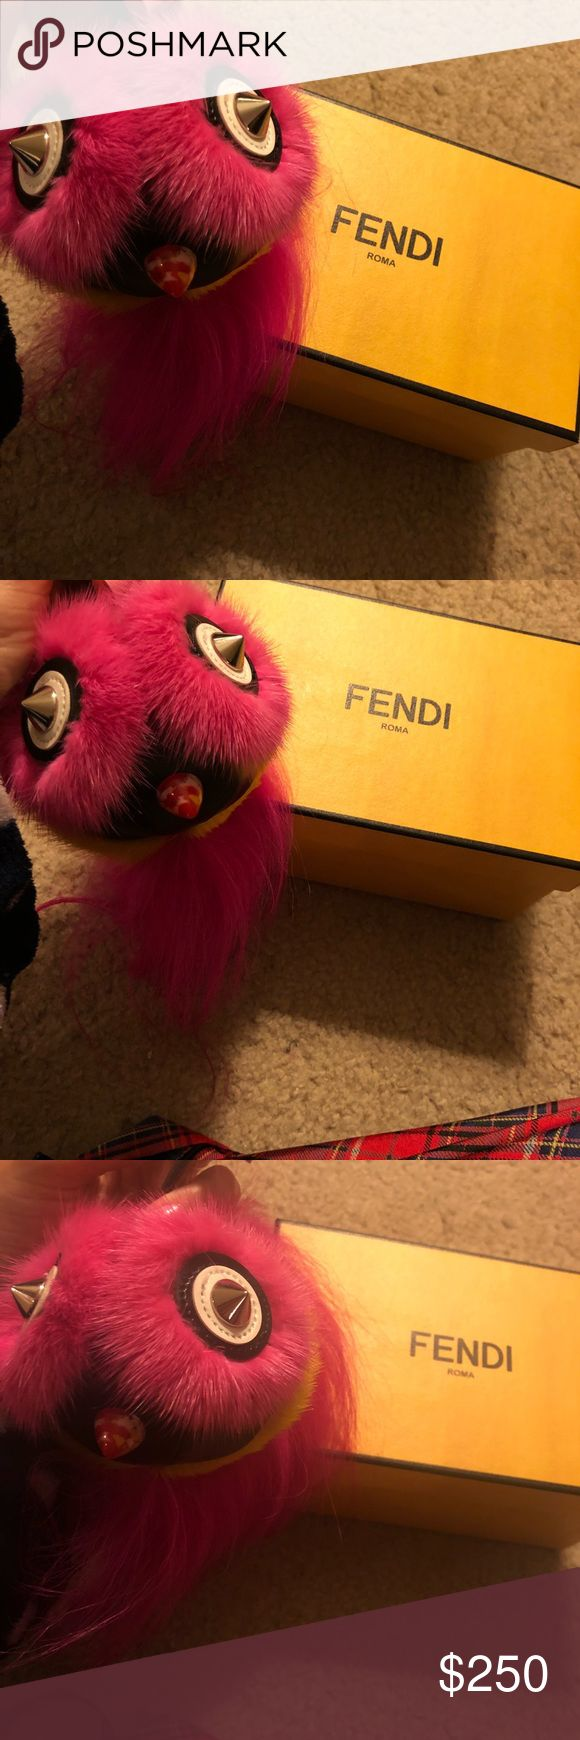 Fendi bag bug Fendi bag bug monster Fendi Bags Shoulder Bags